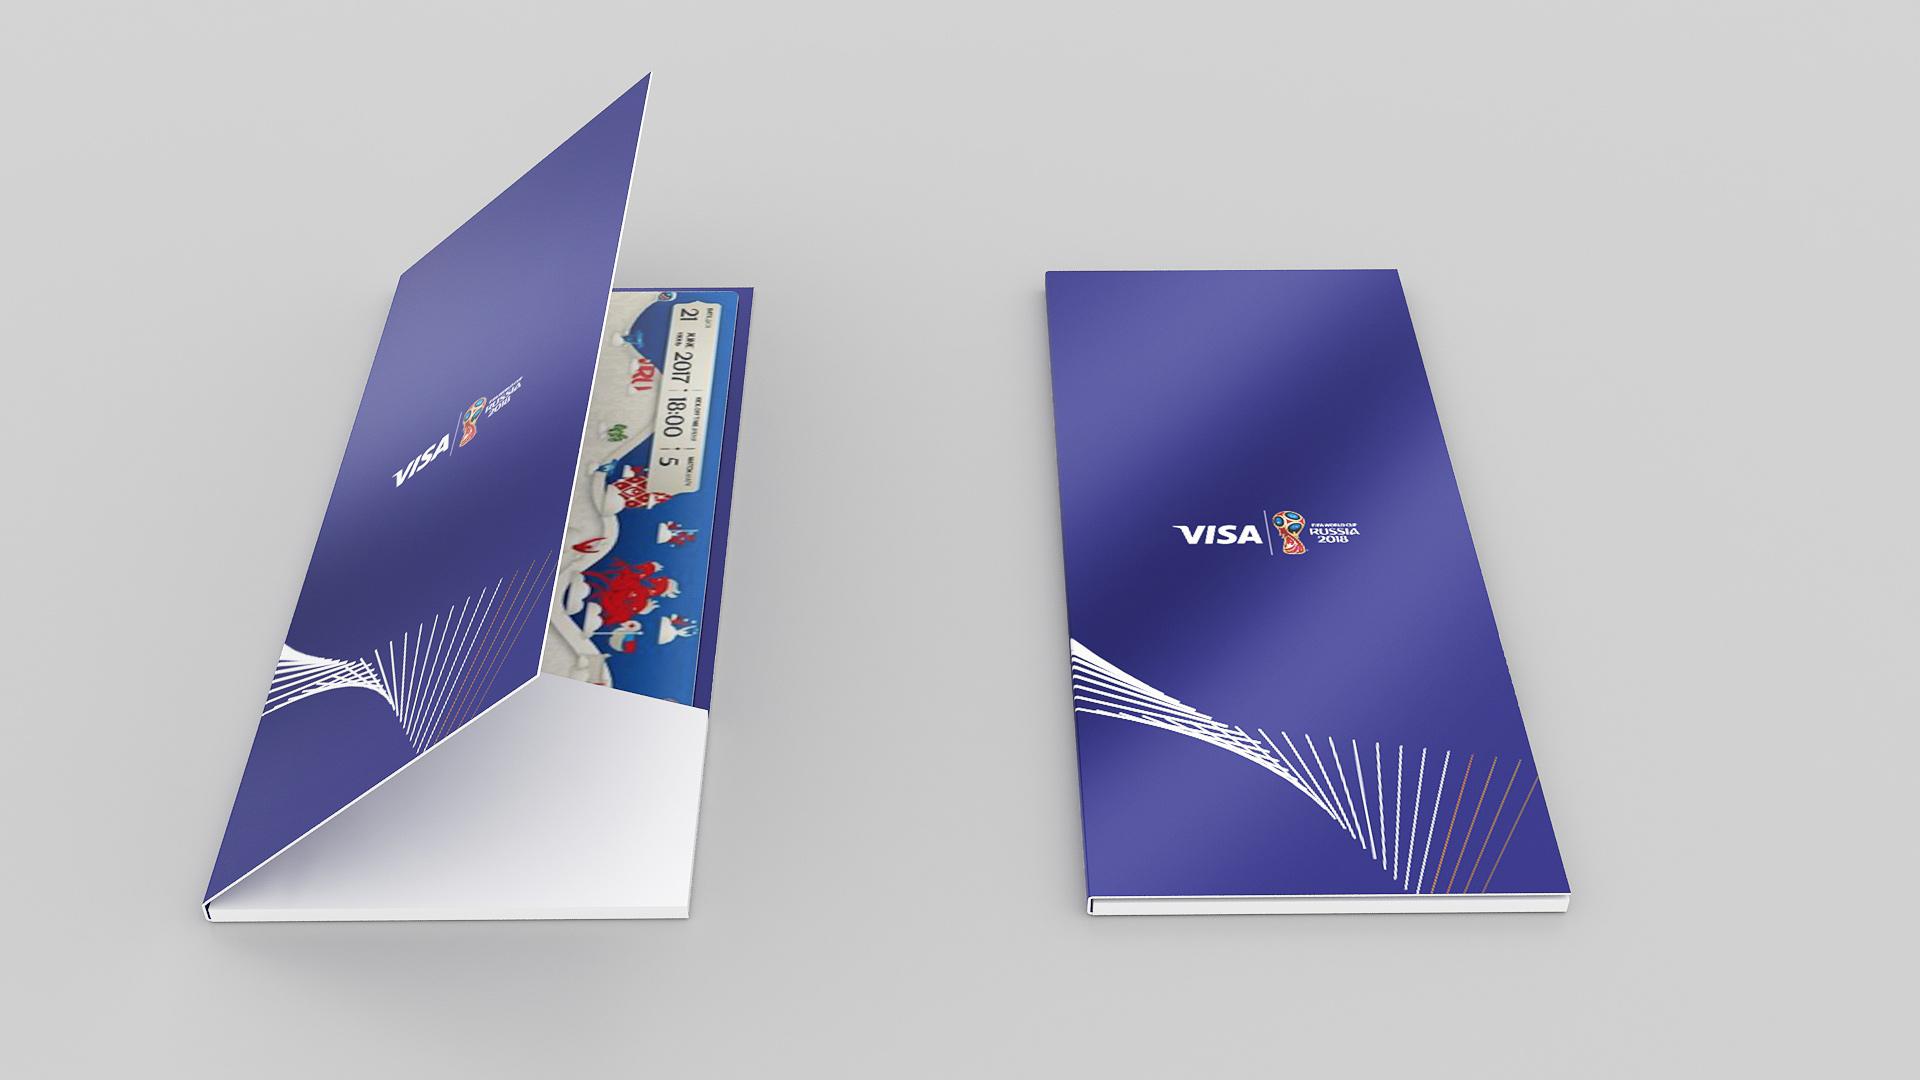 Visa_TicketWallet_Render 06.jpg